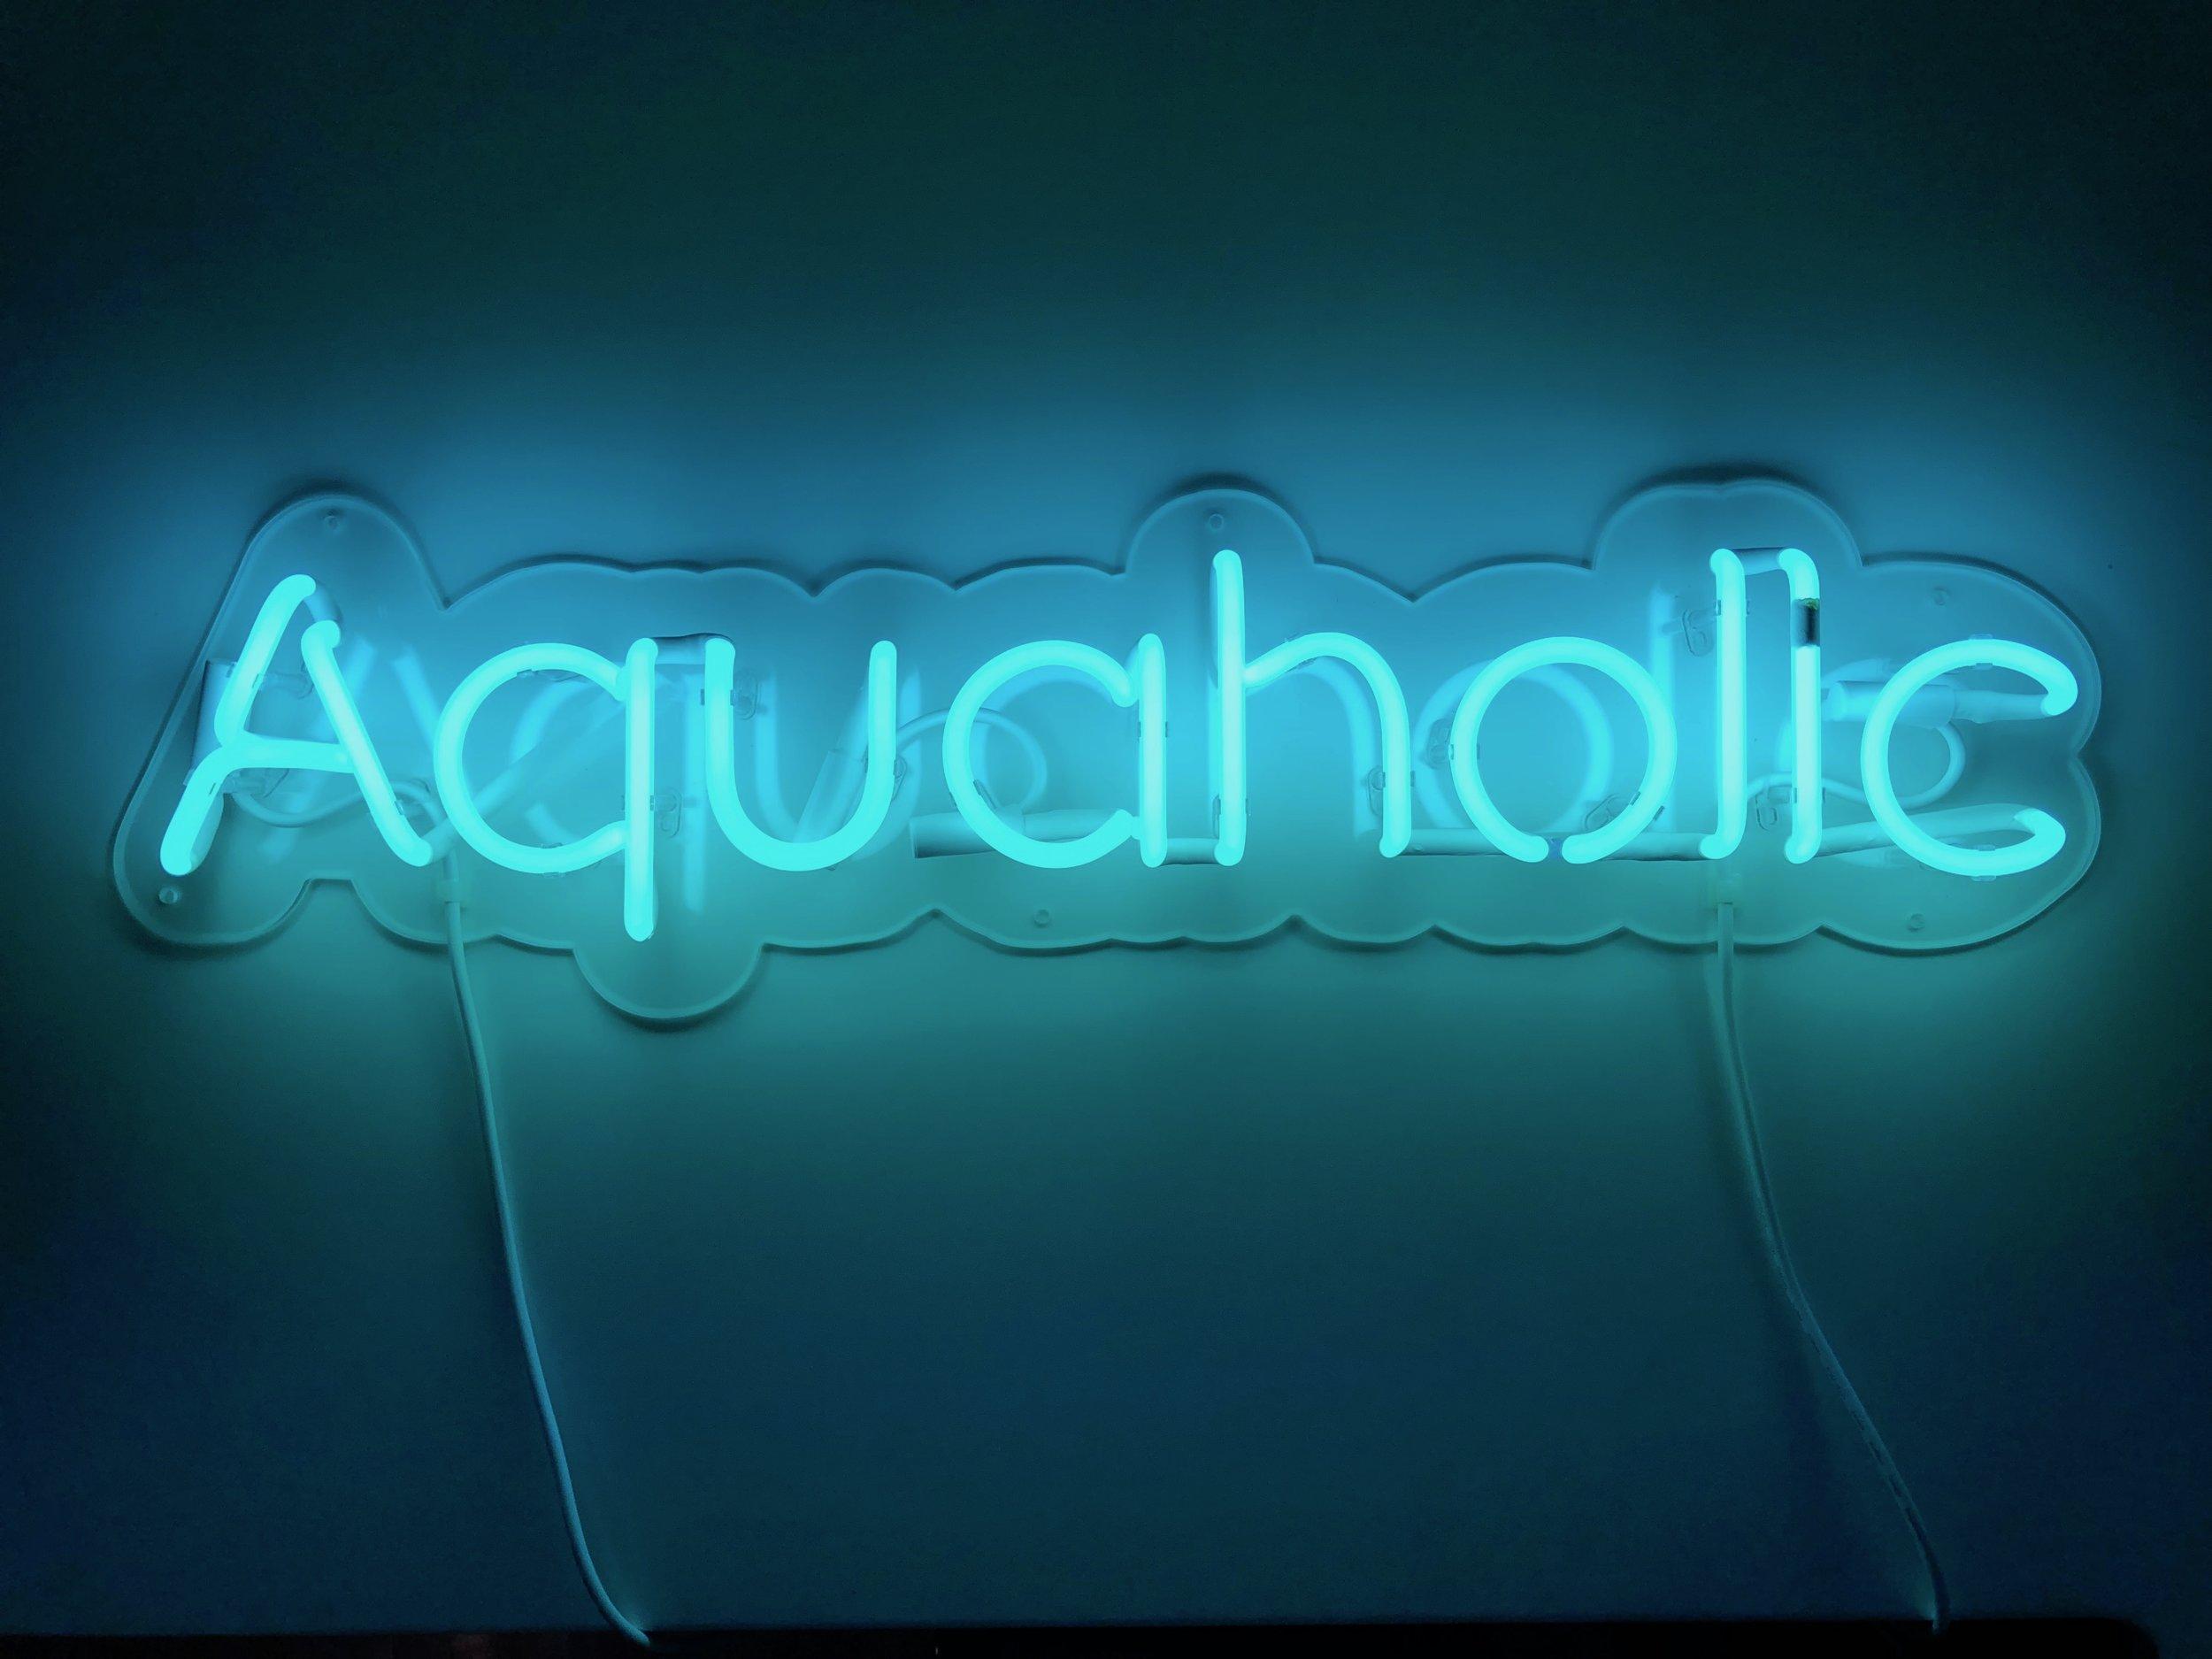 McGonagle_neon_aquaholic.jpg